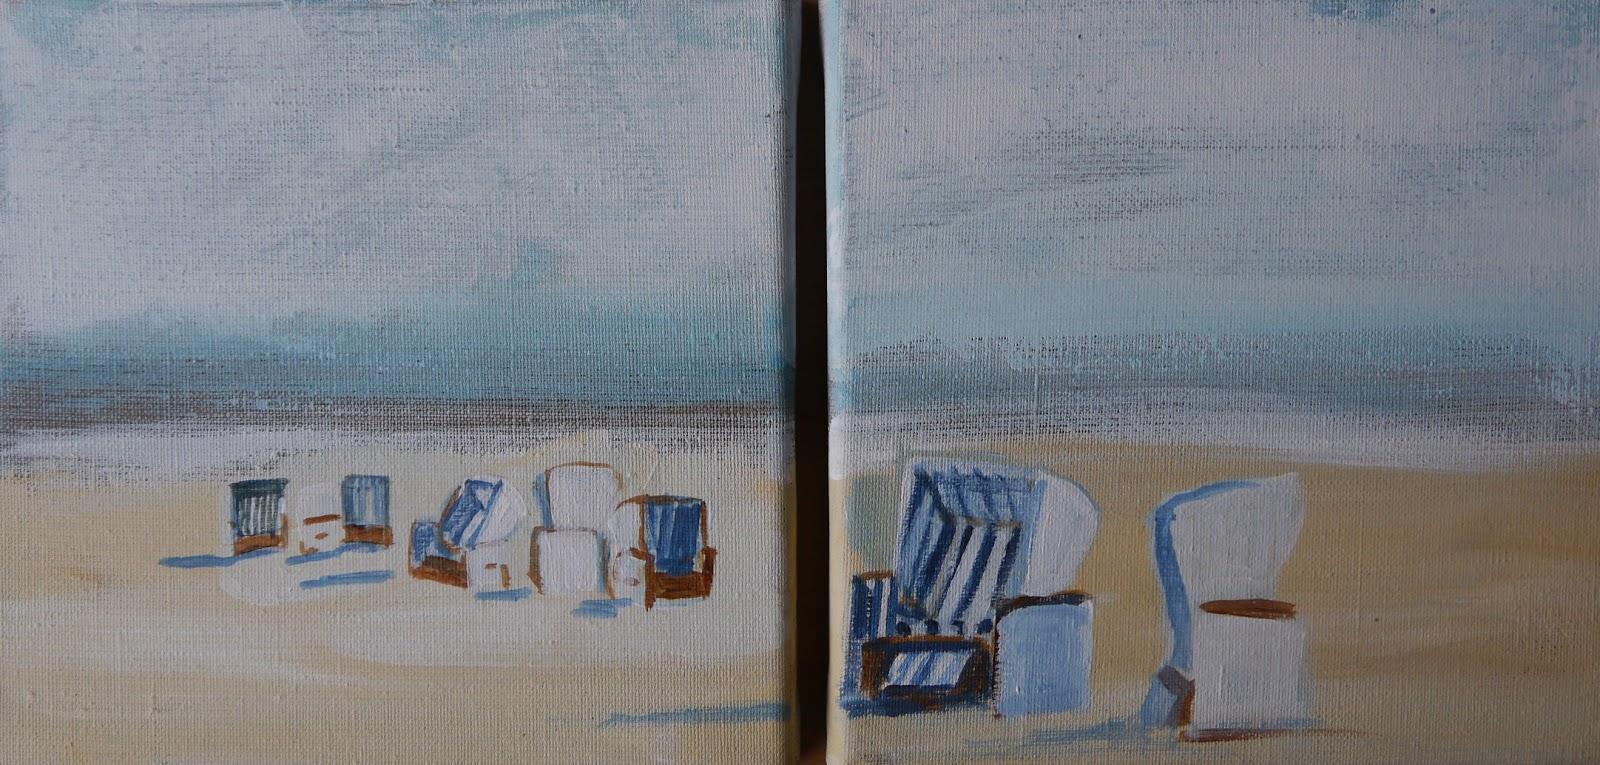 Strandkorb gemalt  Maritime Kunst | Atelier Malerei | Art of Sailing .... Meer als ein ...